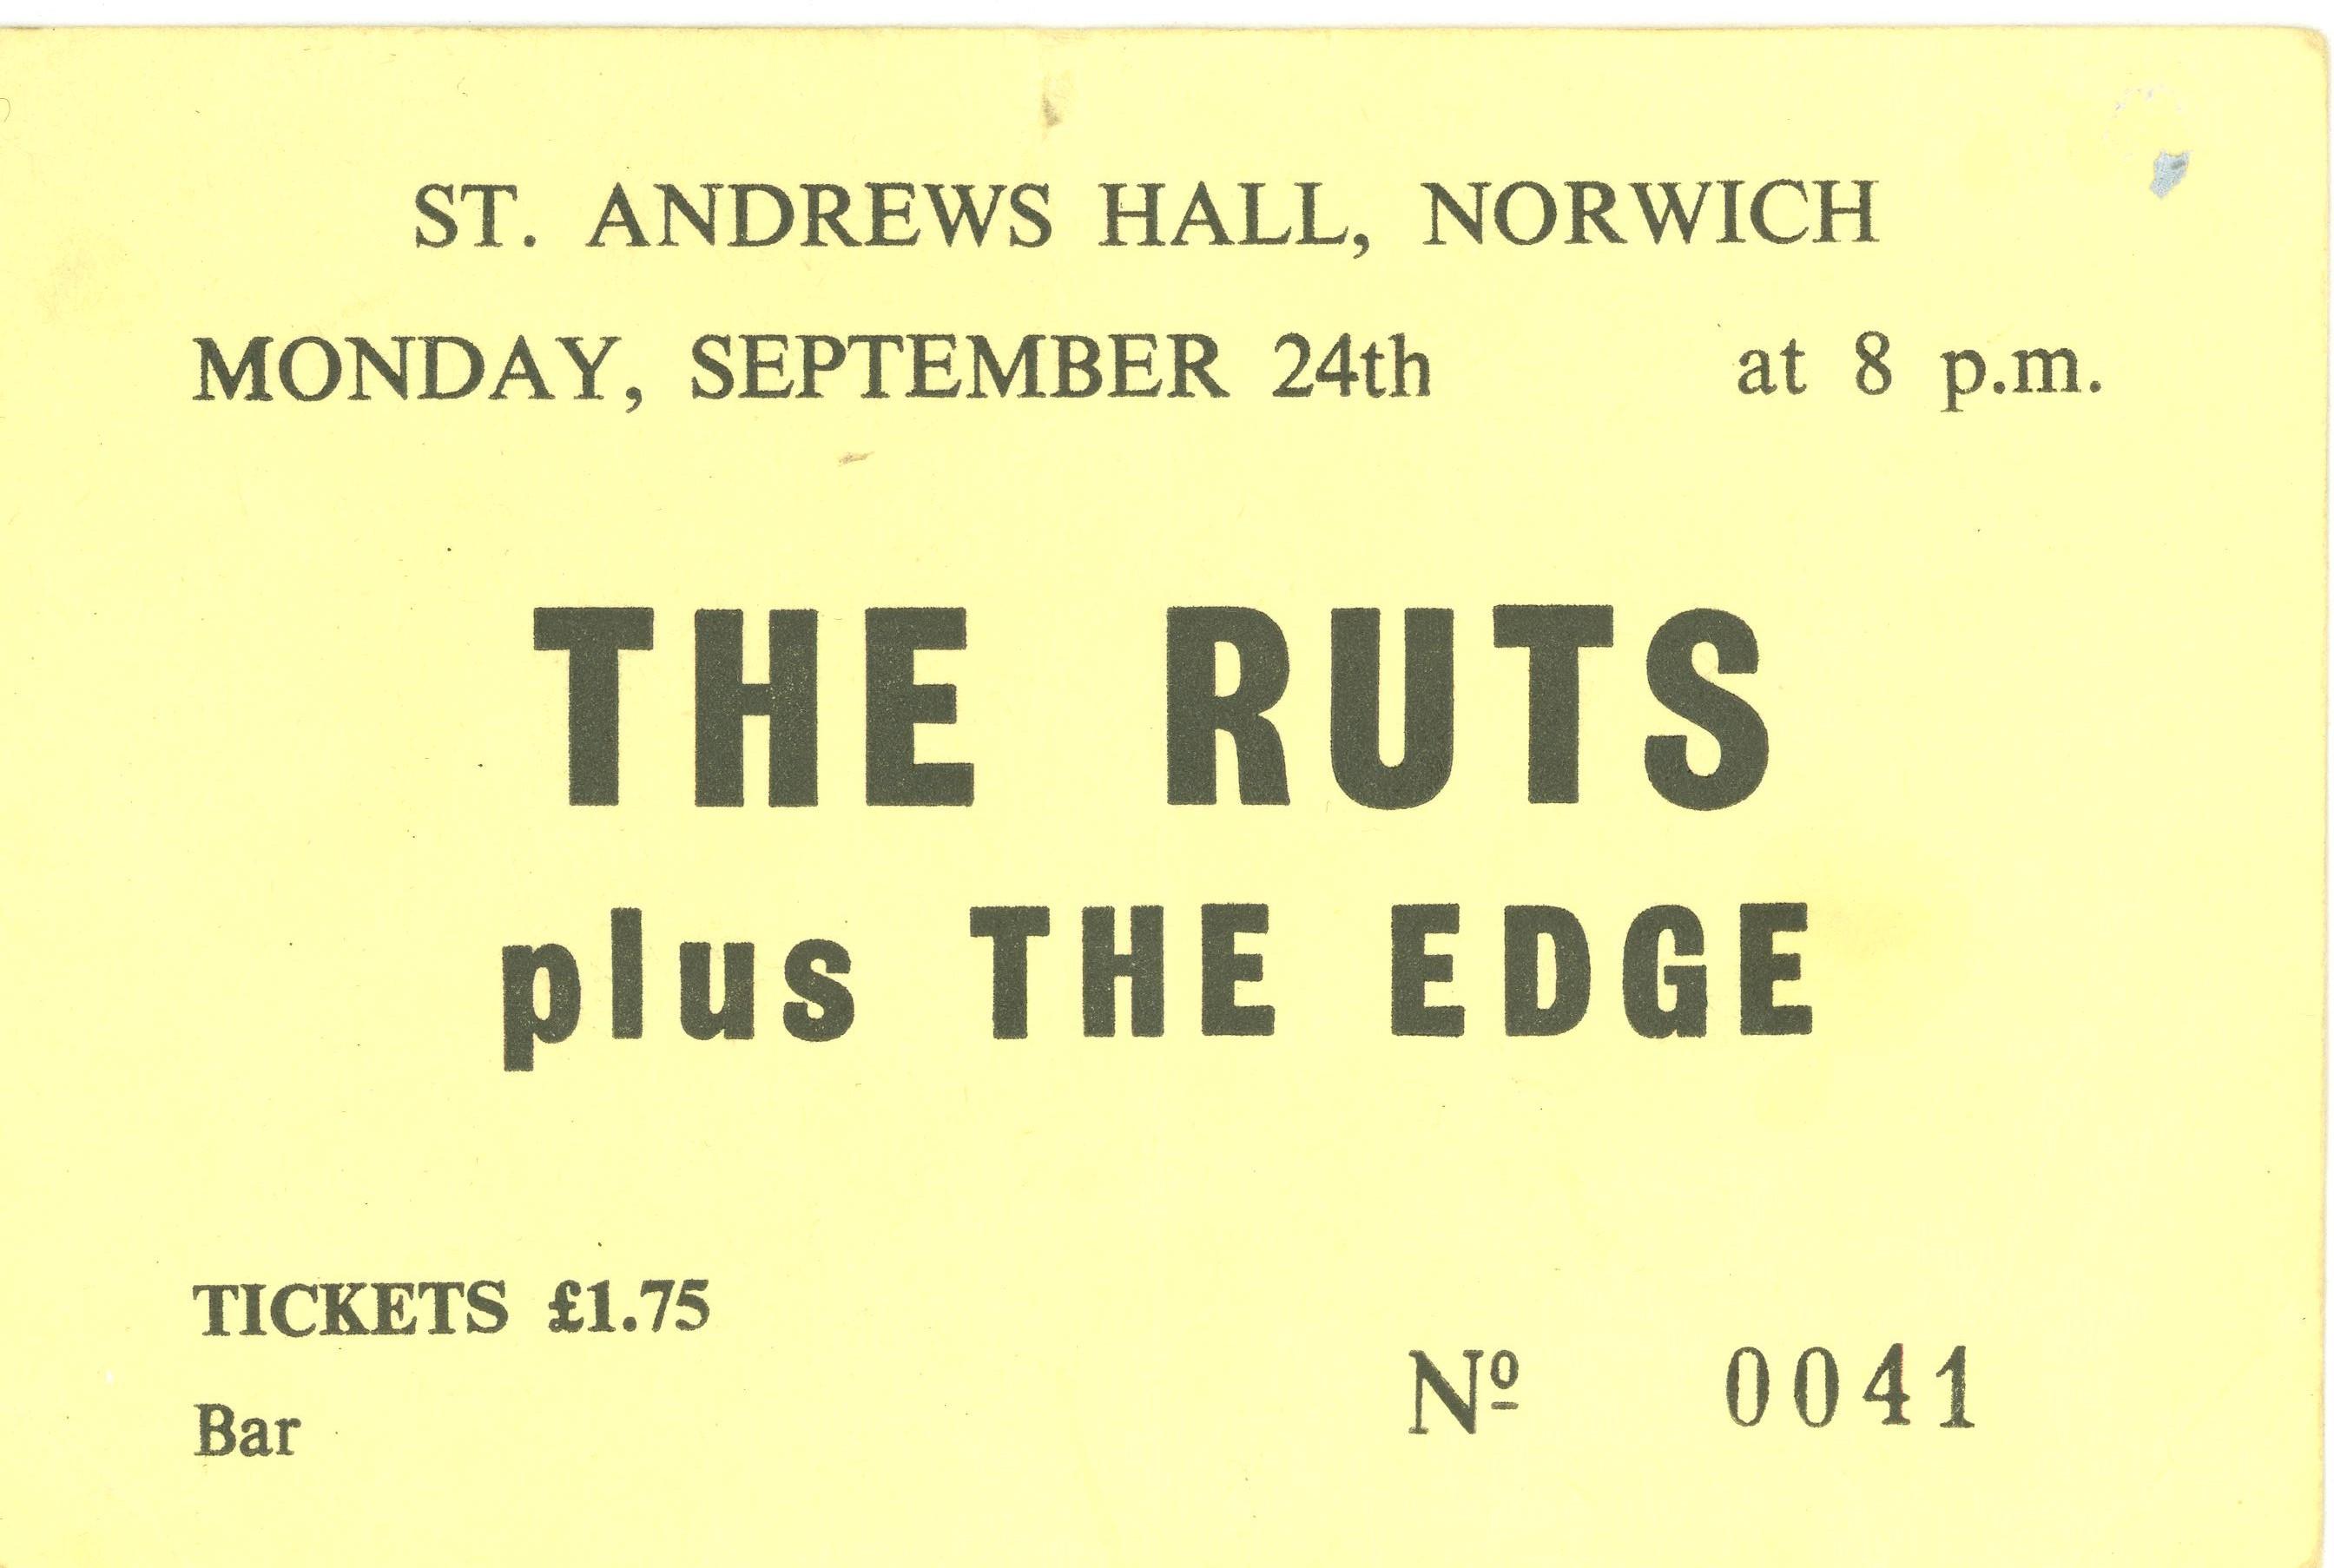 The Ruts plus The Edge